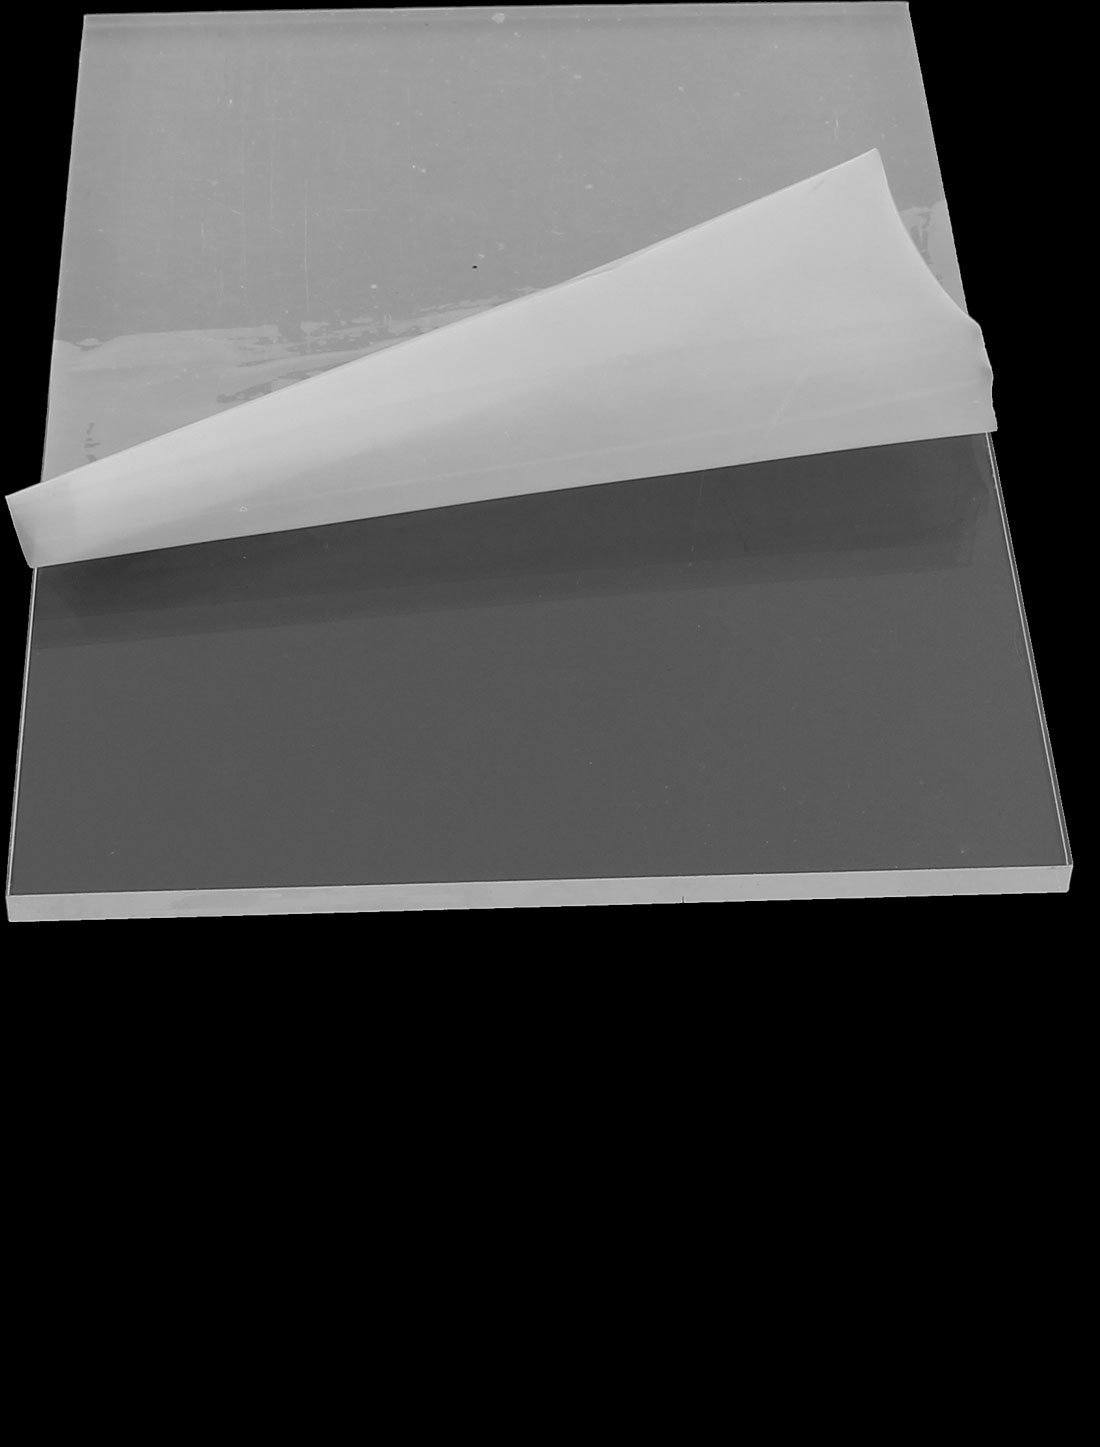 4 mm de pl/ástico transparente de acr/ílico del corte de plexigl/ás Hoja A5 Tama/ño 148mm x 210mm